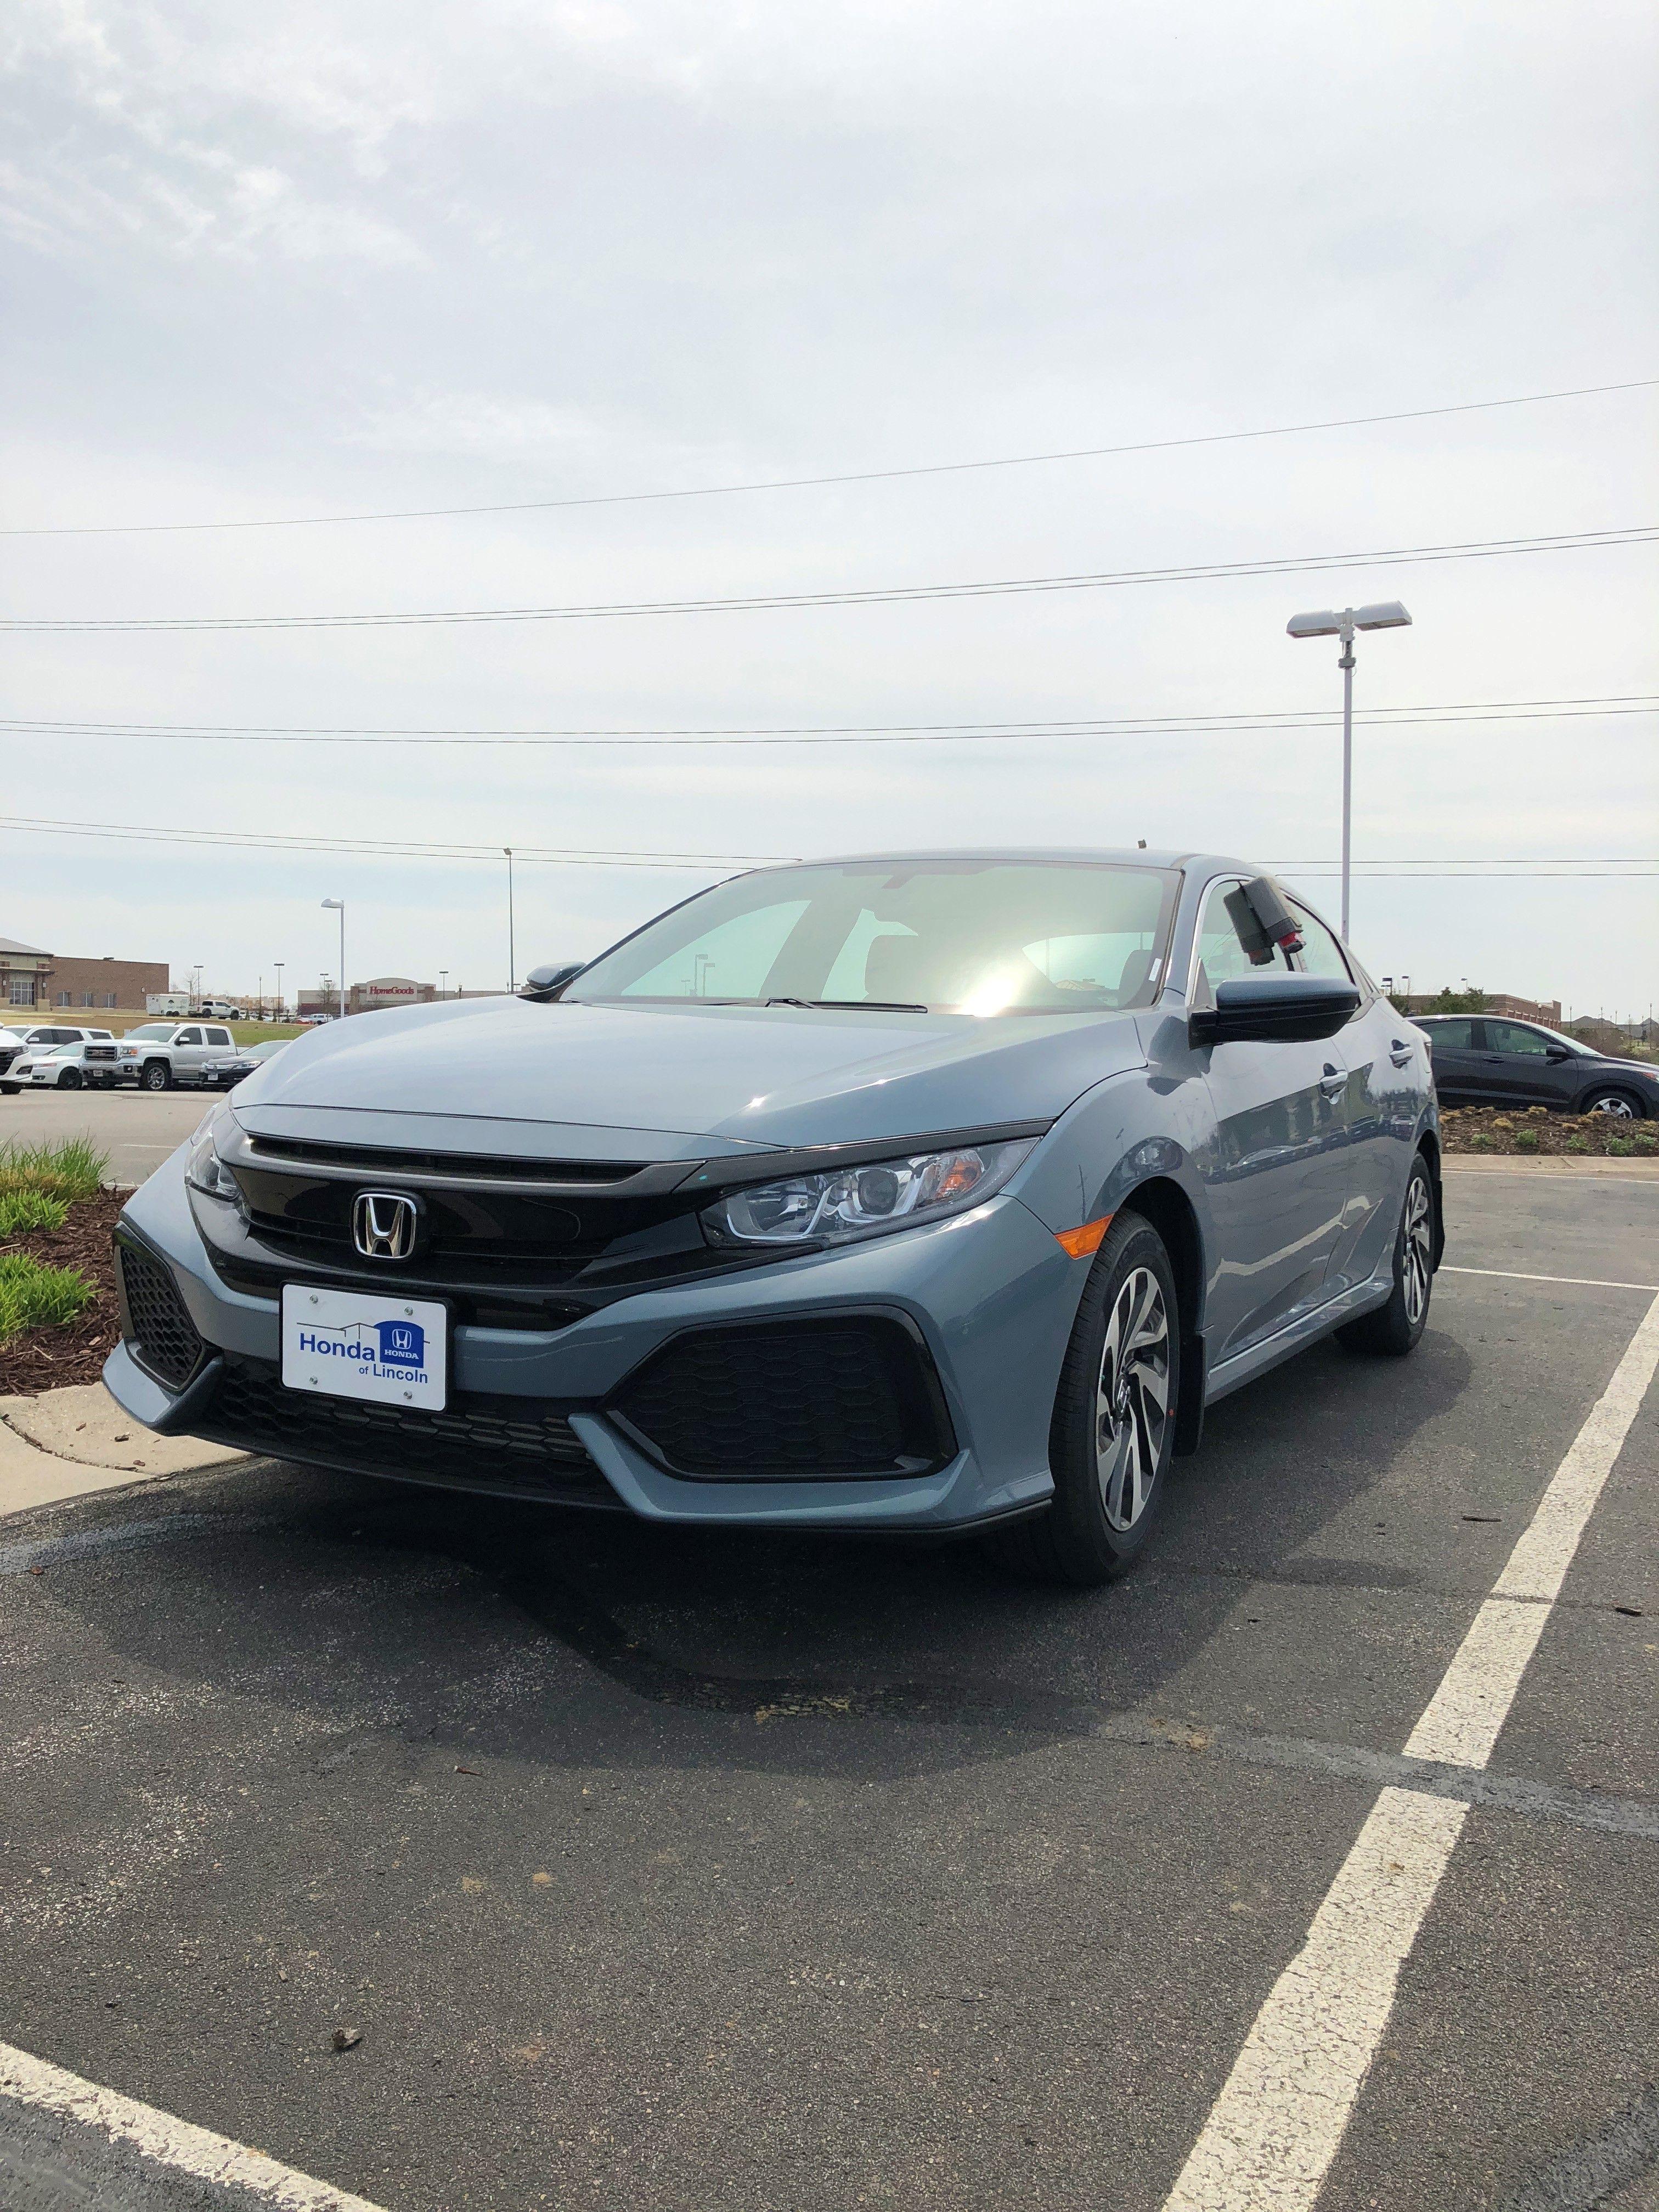 New Honda Civic Lincoln New Honda Civic Models For Sale Honda Civic Hatchback Honda Civic Models Honda Civic